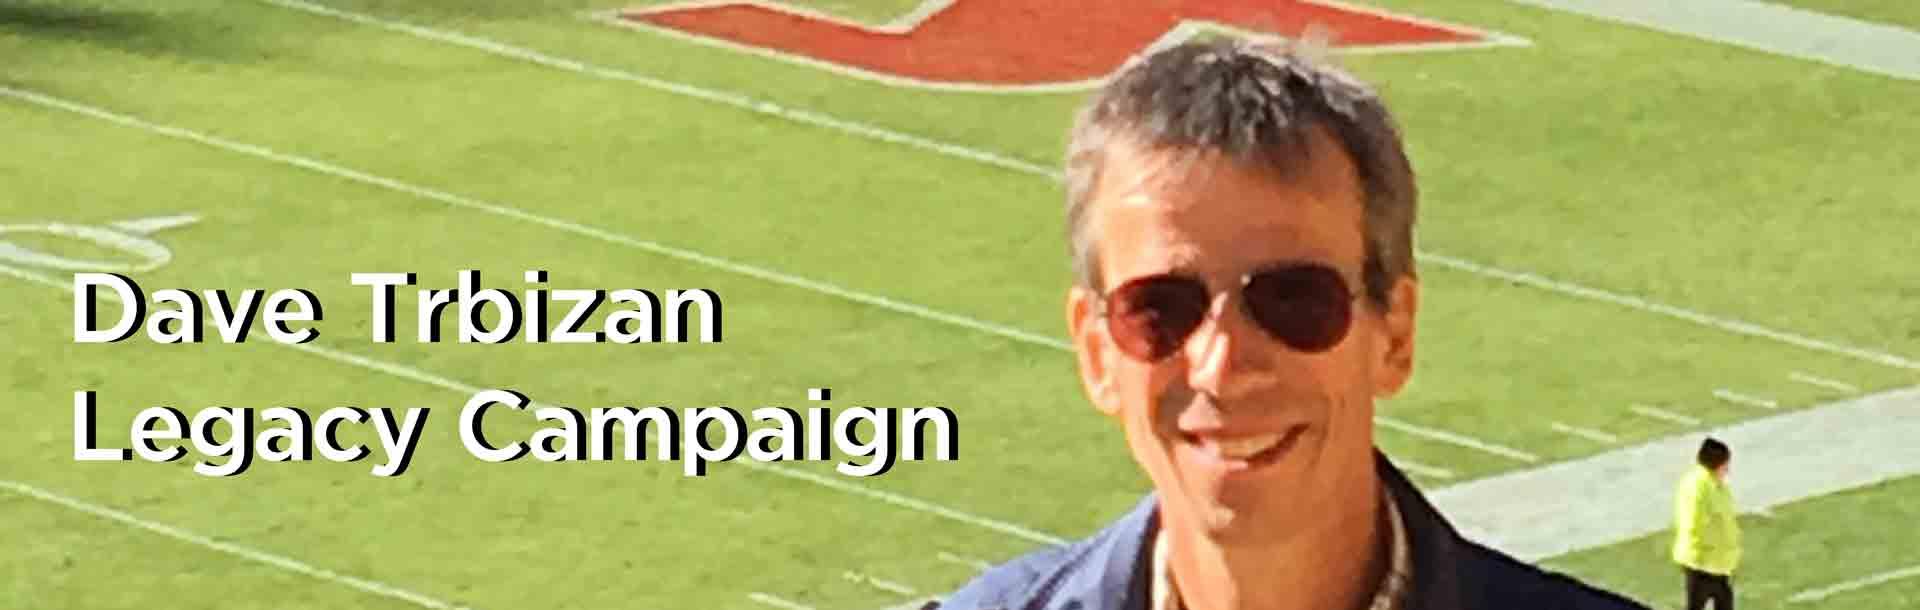 Dave Trbizan Legacy Campaign